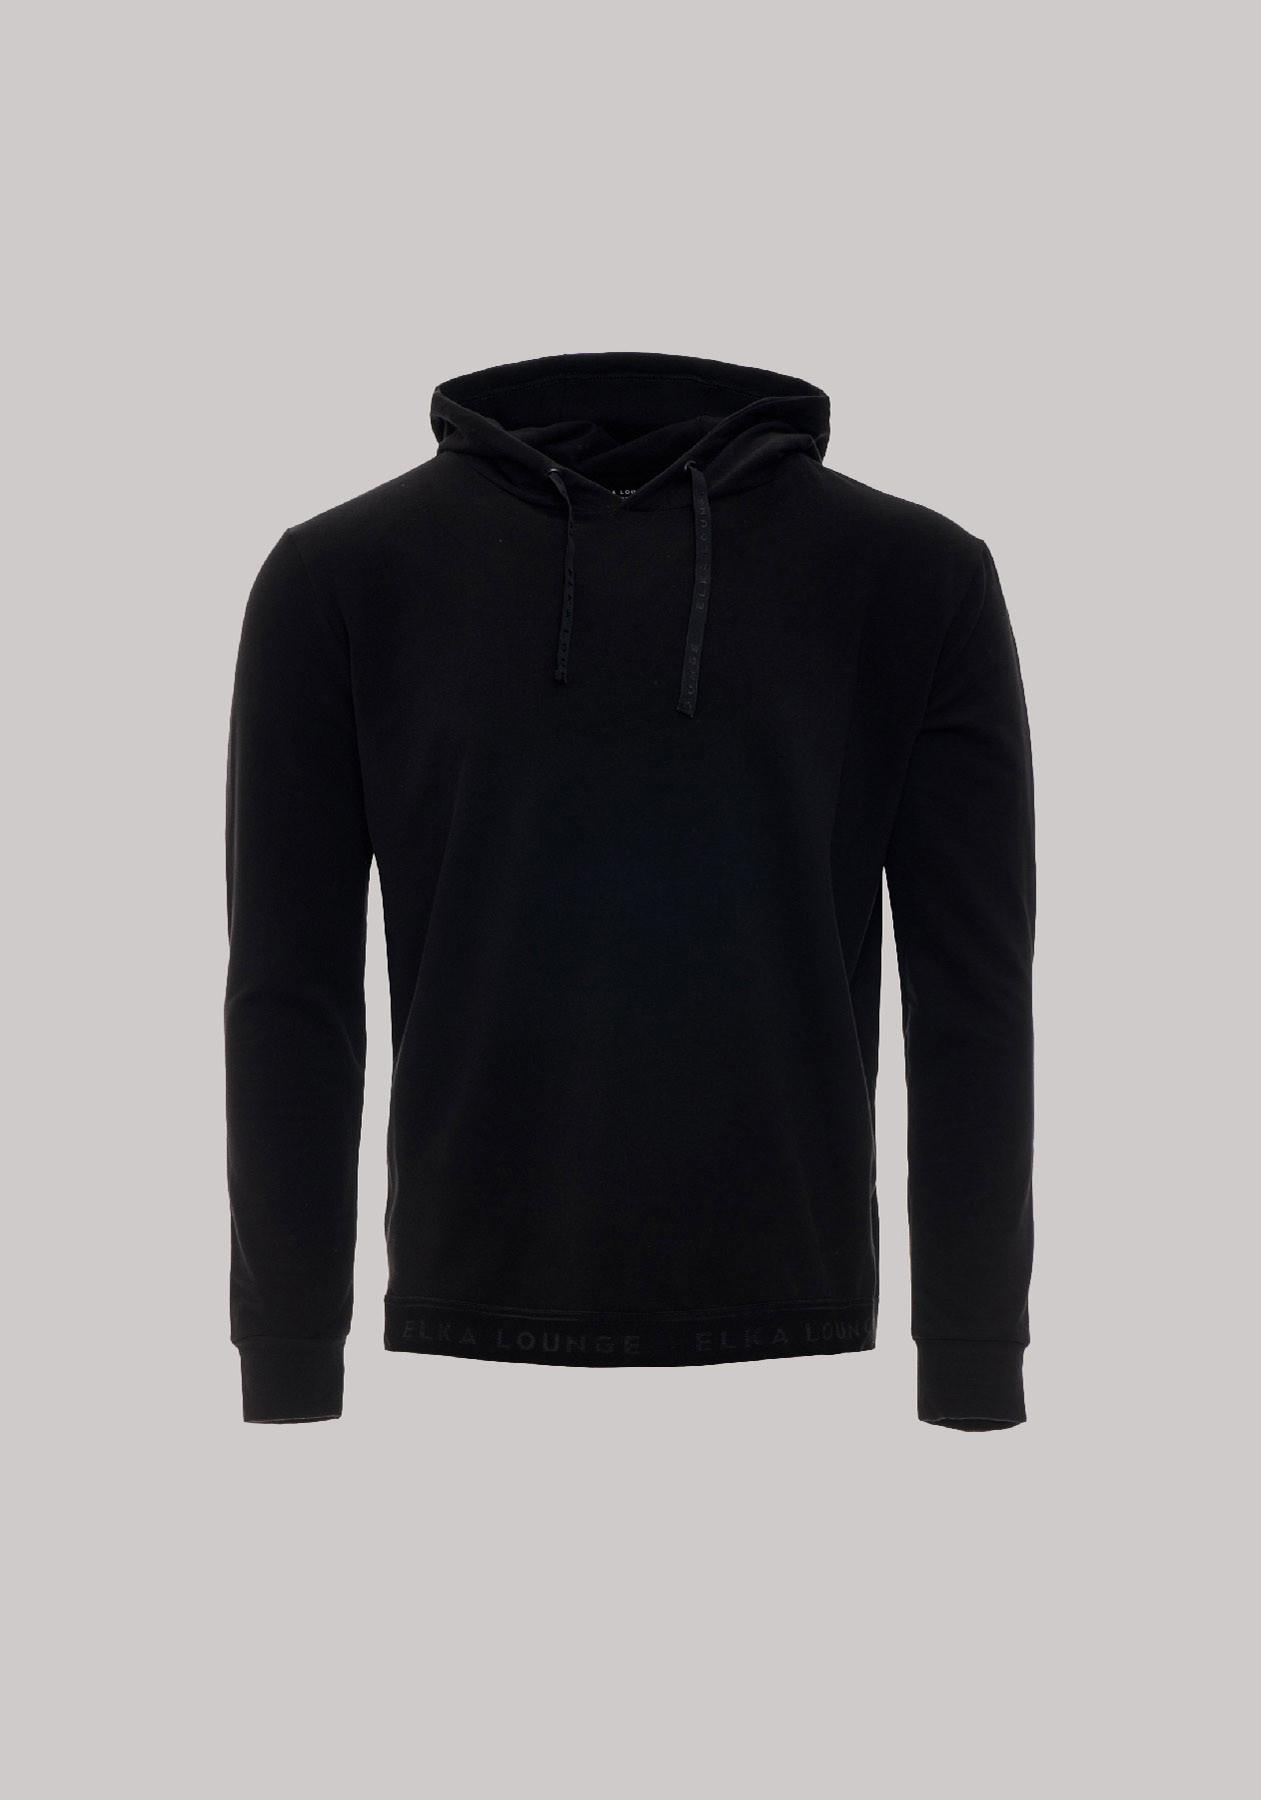 Men-Sweatshirt-ELKA-Lounge-M00574-02